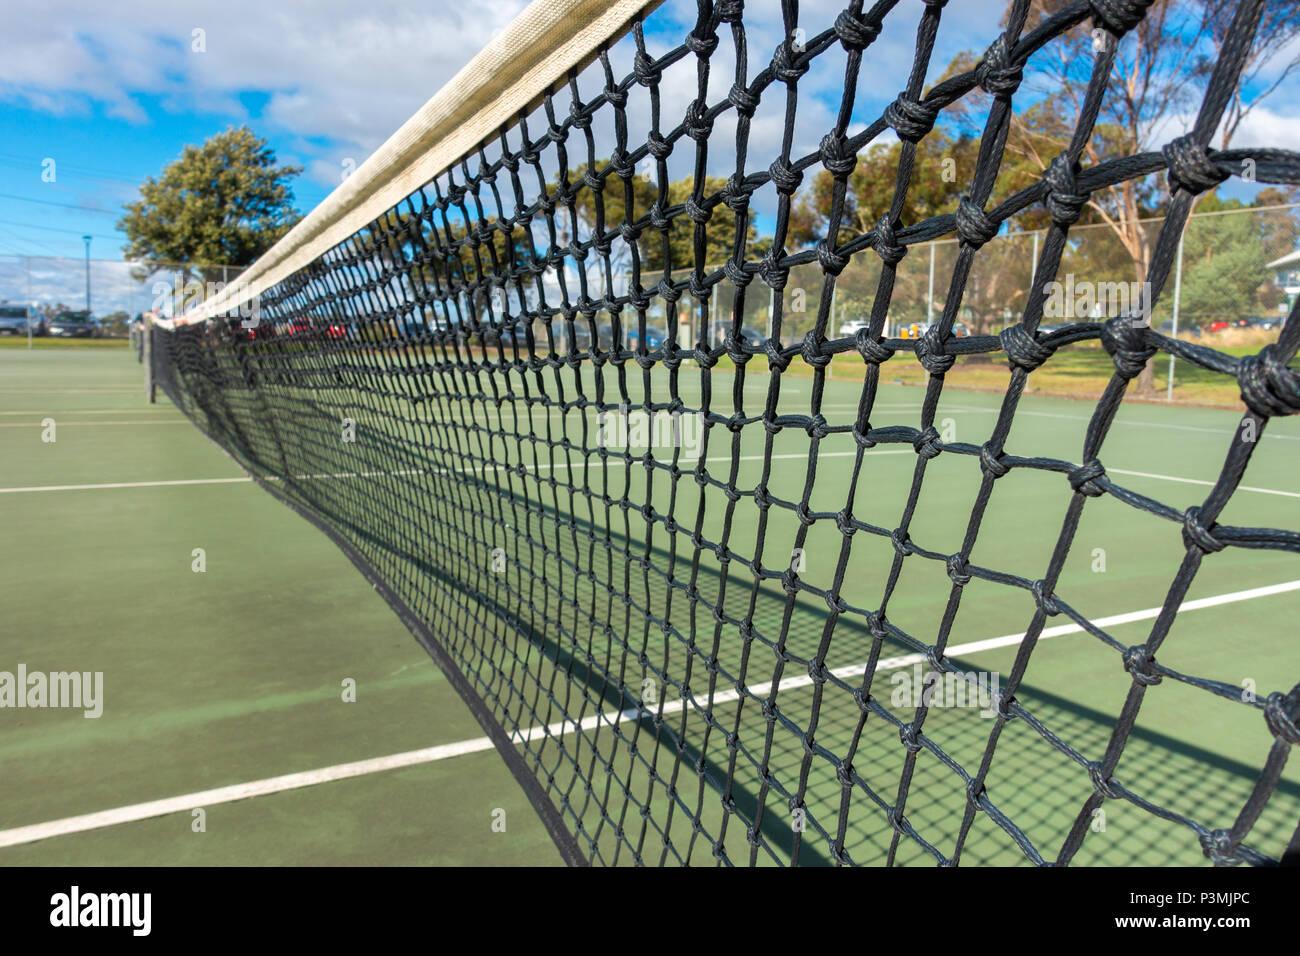 Net en pista de tenis gratuita en Footscray Park. Melbourne, Australia VIC Imagen De Stock